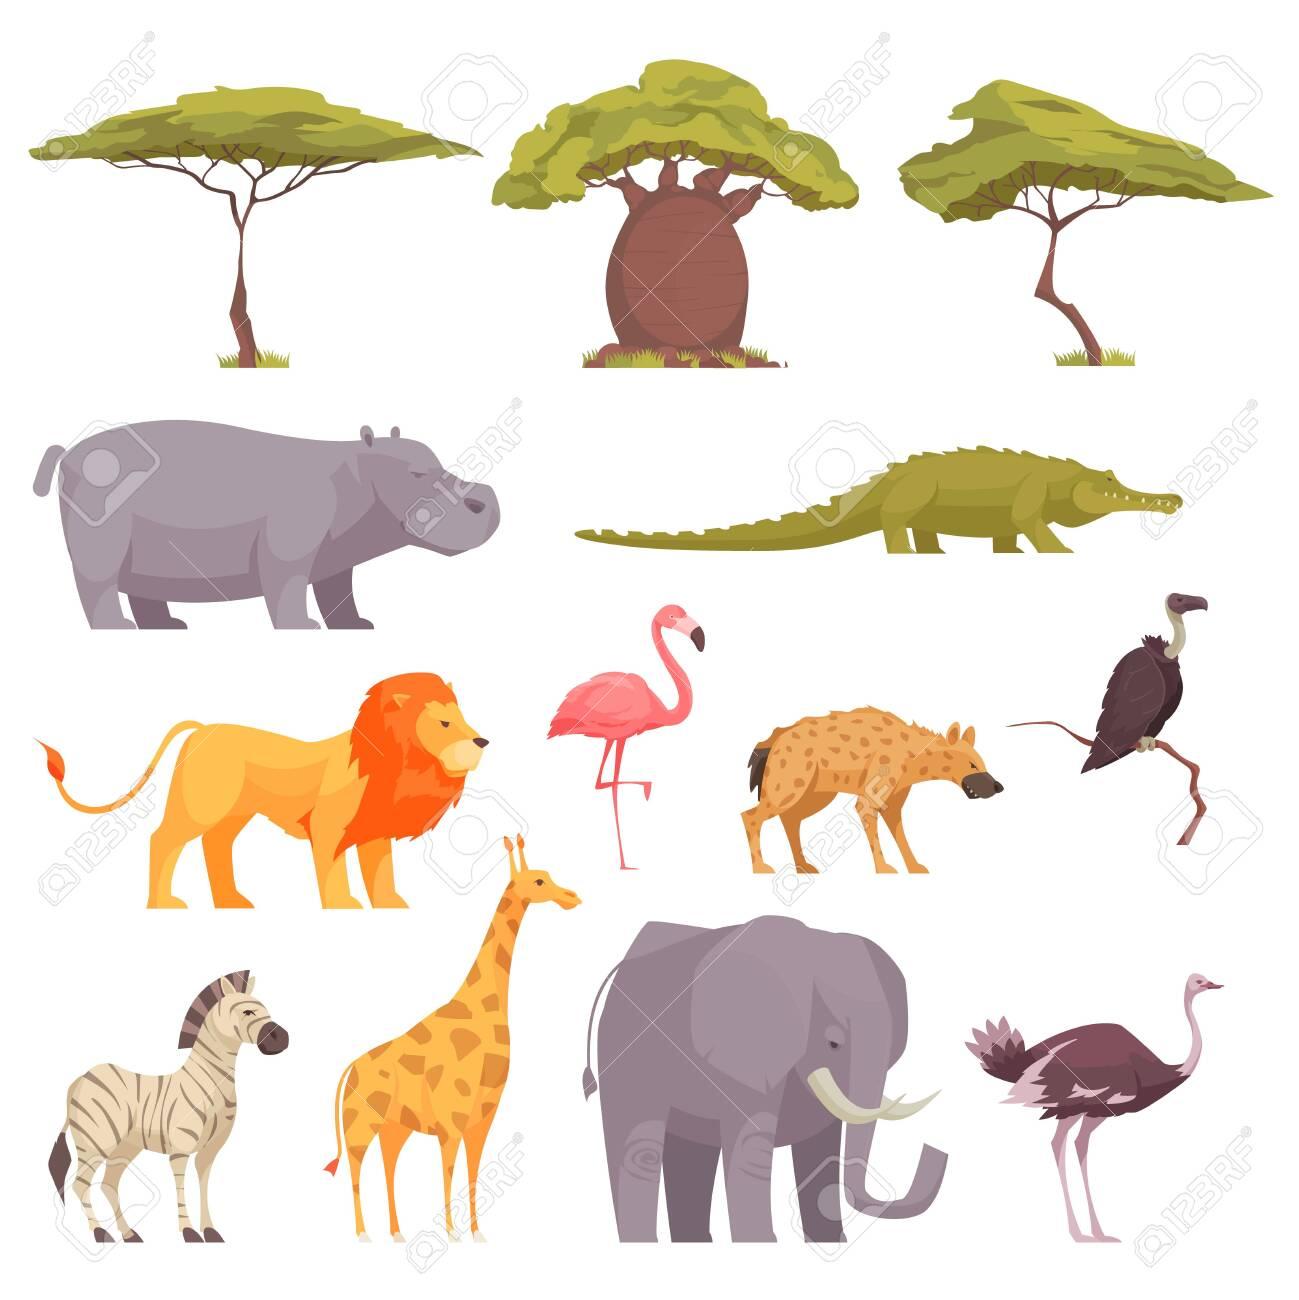 Safari wild animals birds trees flat icons collection with baobab acacia crocodile zebra flamingo lion vector illustration - 134171251